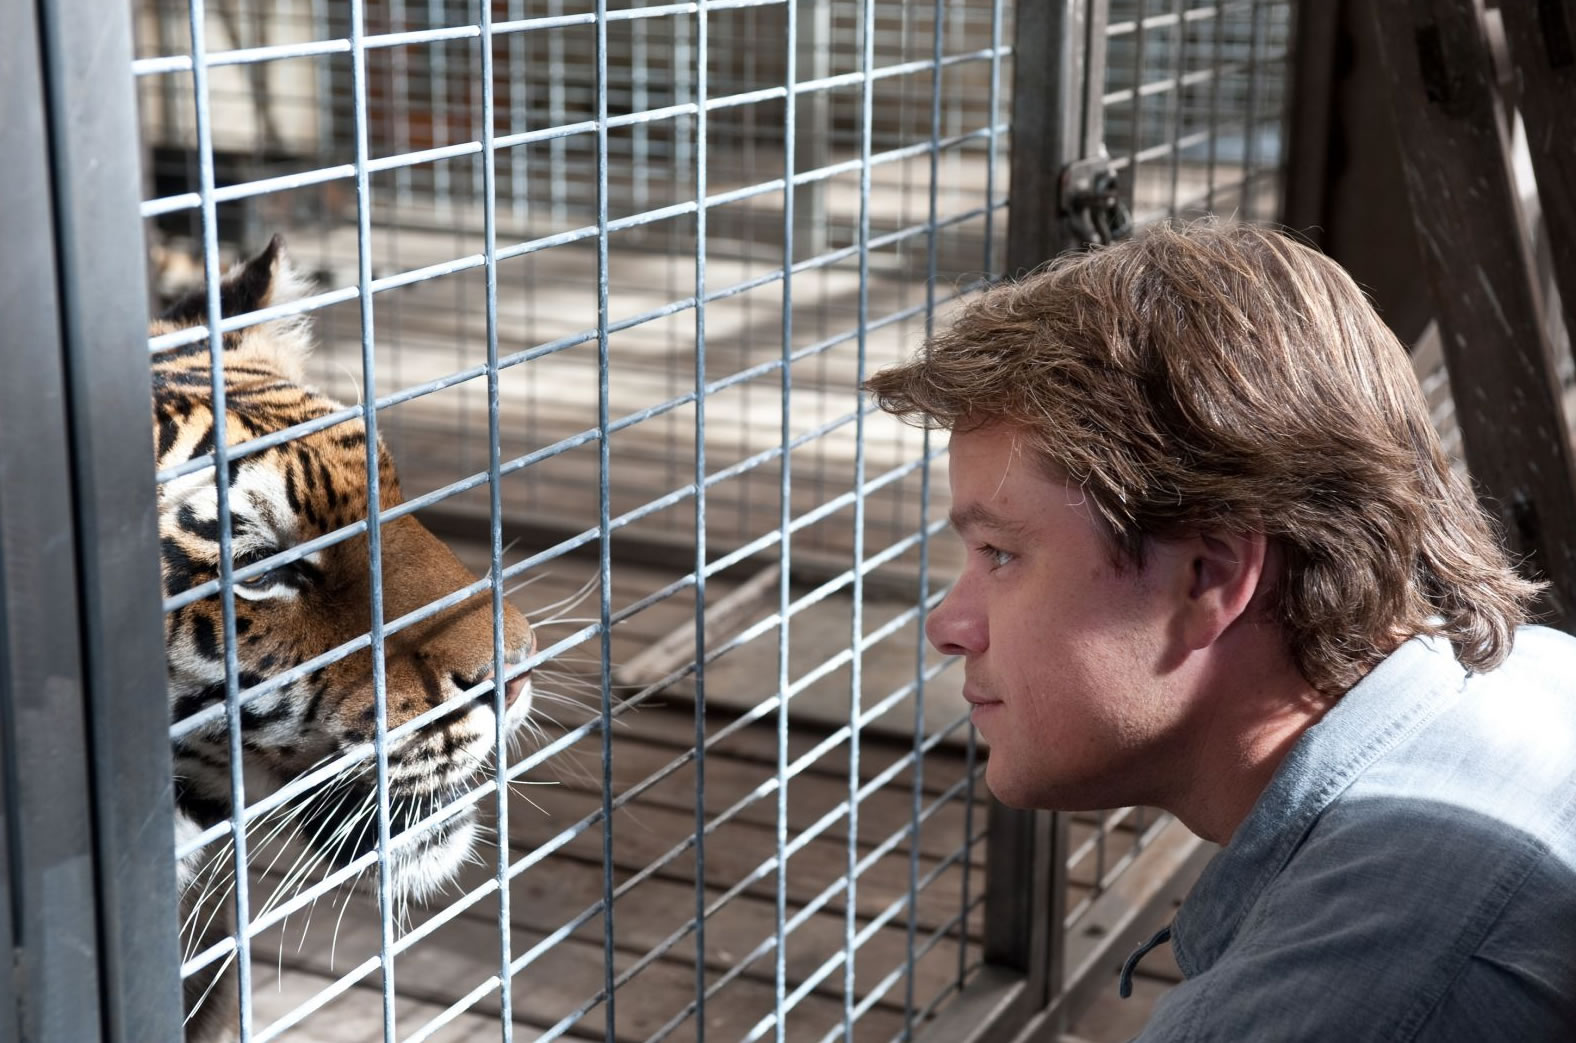 http://3.bp.blogspot.com/-CBHqEJCZmOA/T7asea04tOI/AAAAAAAAA1k/g3VOy6jkkE8/s1600/we-bought-a-zoo-movie-image-matt-damon-tiger-01.jpg